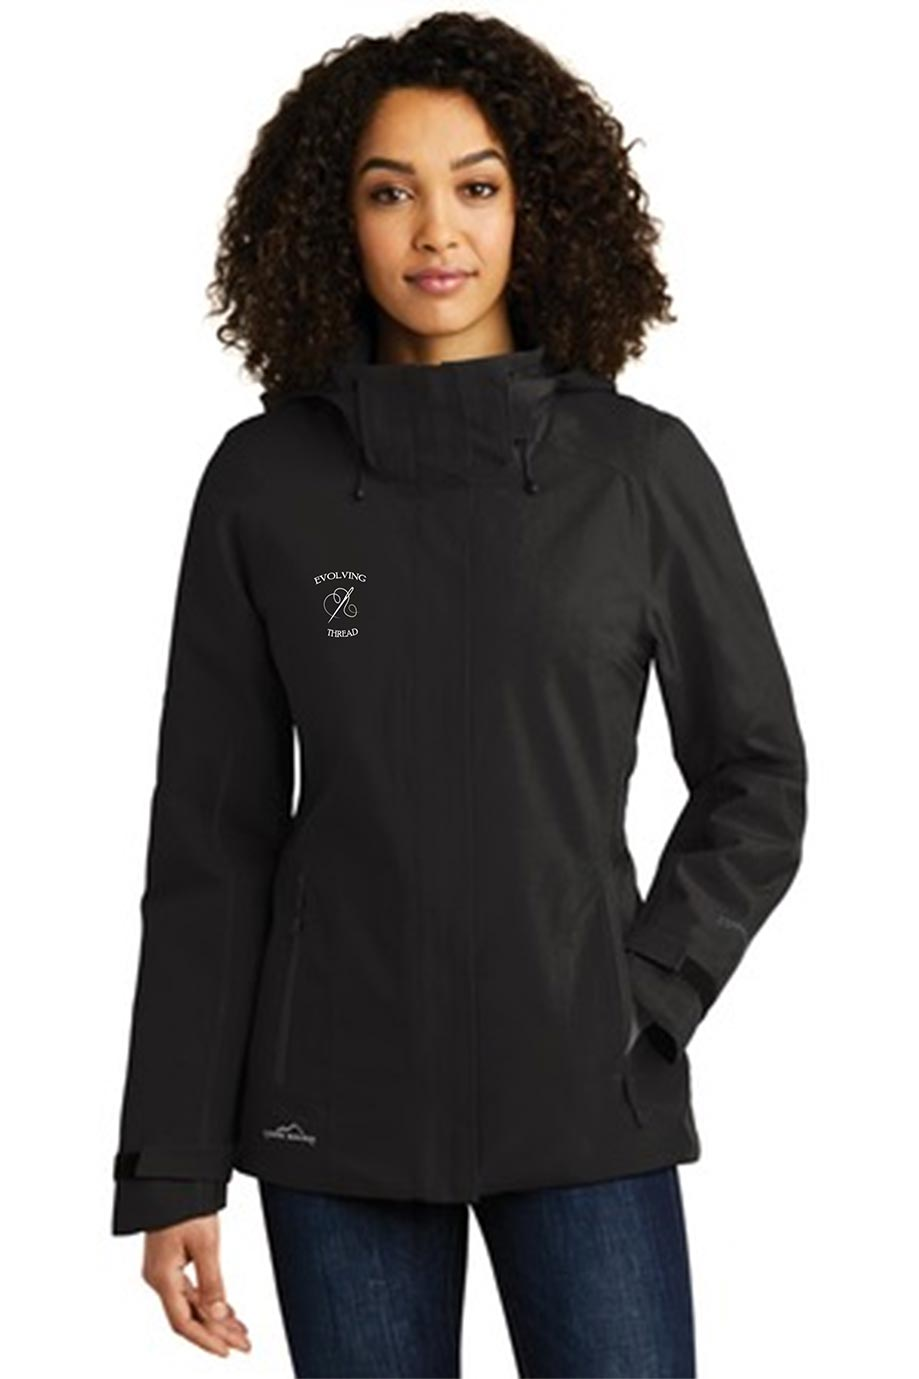 custom design of Eddie Bauer EB555 - Ladies WeatherEdge® Plus Insulated Jacket